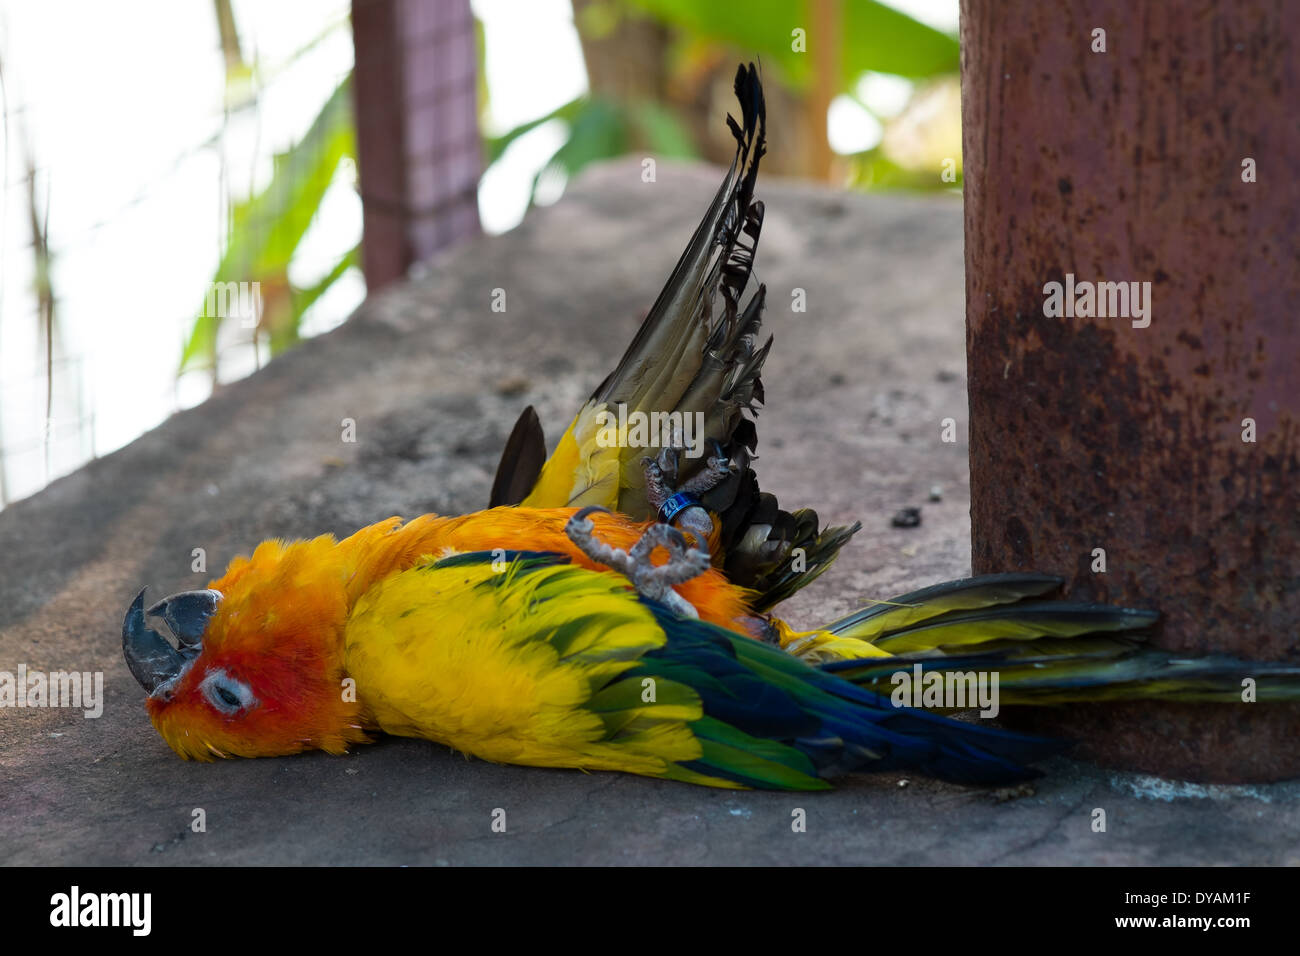 Dead Parrot - Stock Image